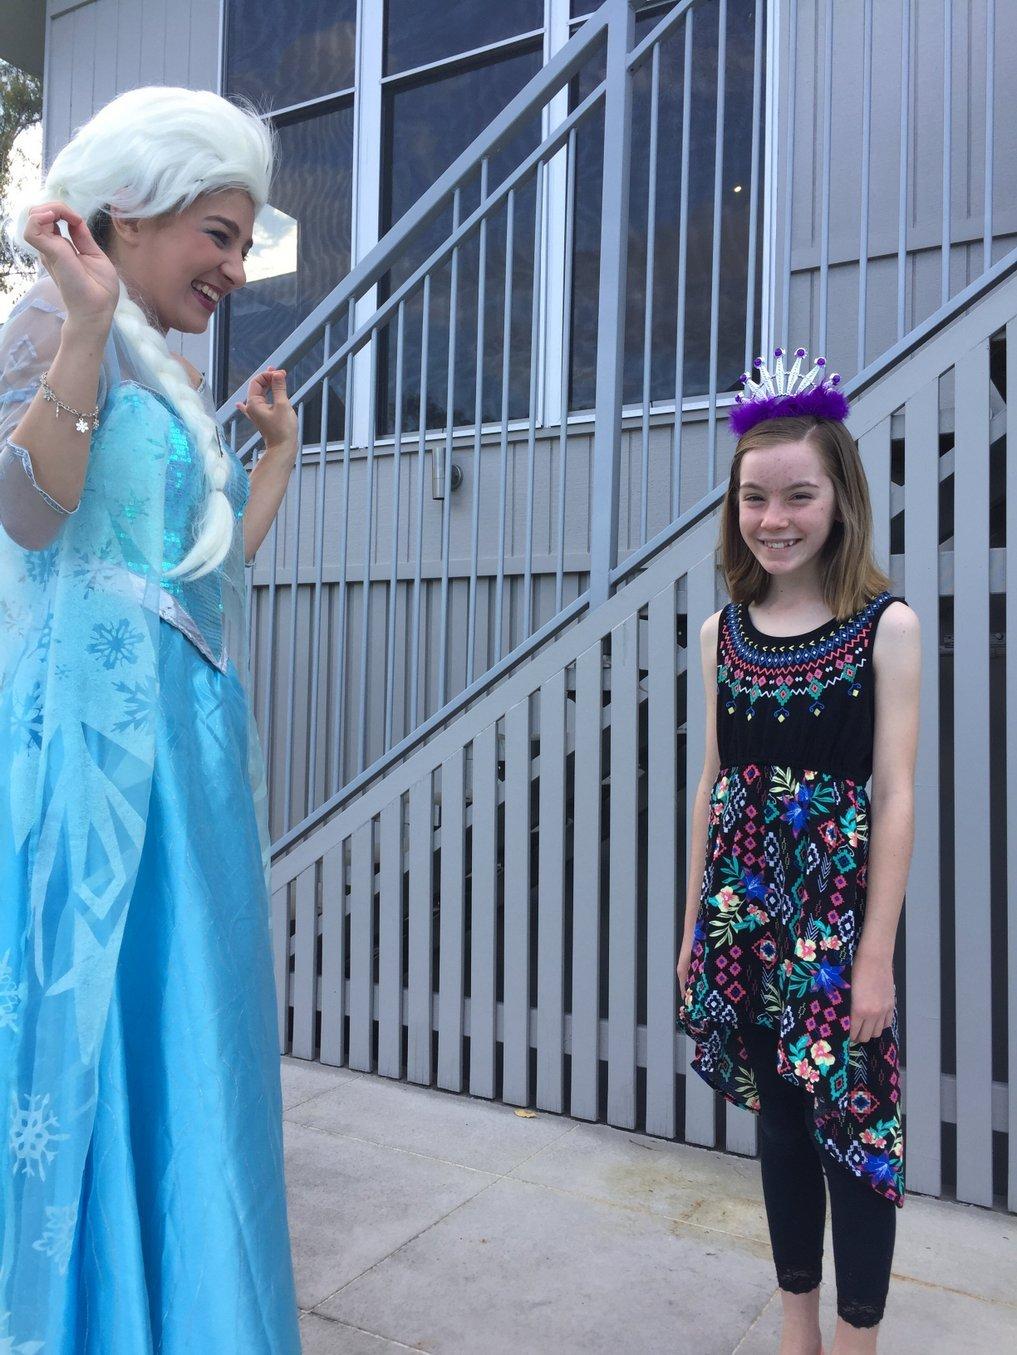 Princess Party Performers - brisbane